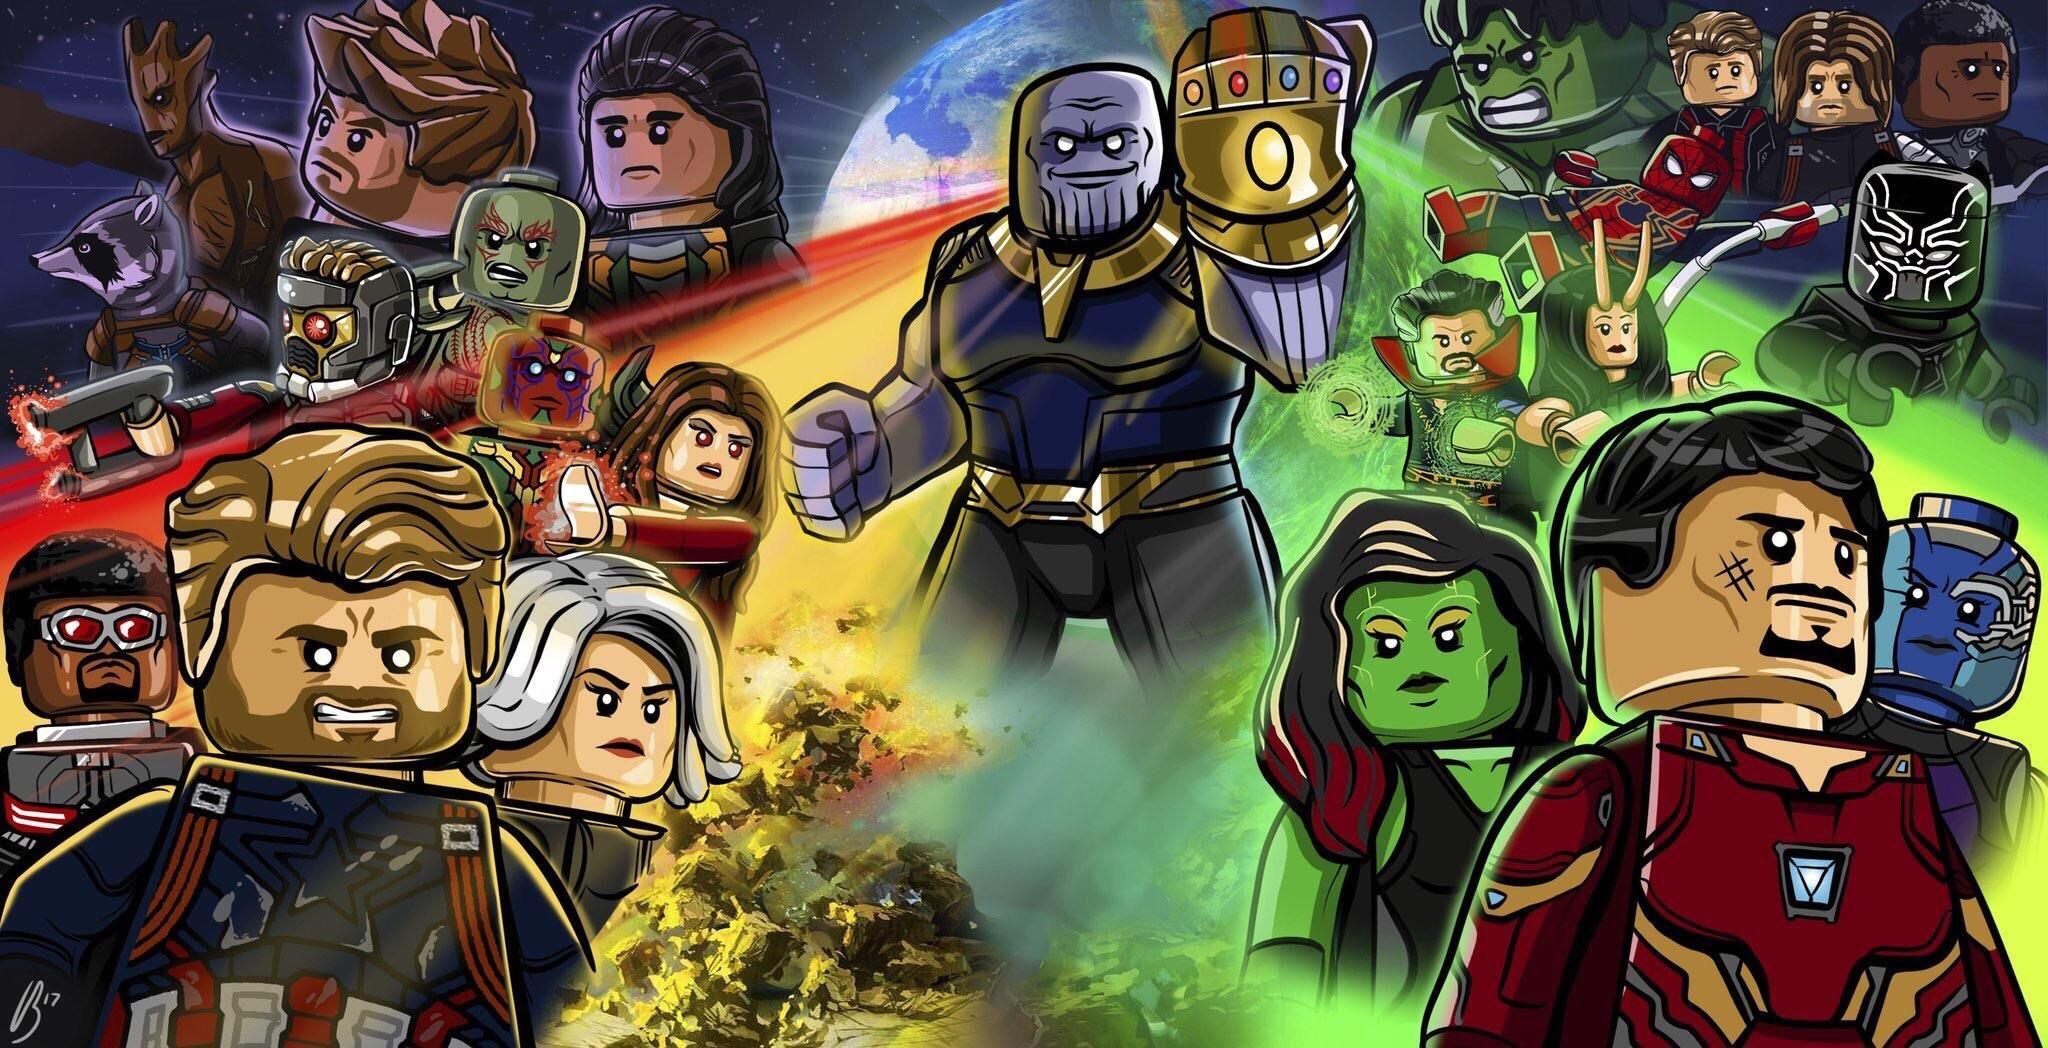 Lego Avengers Infinity War Poster Image Marvel Amp Dc